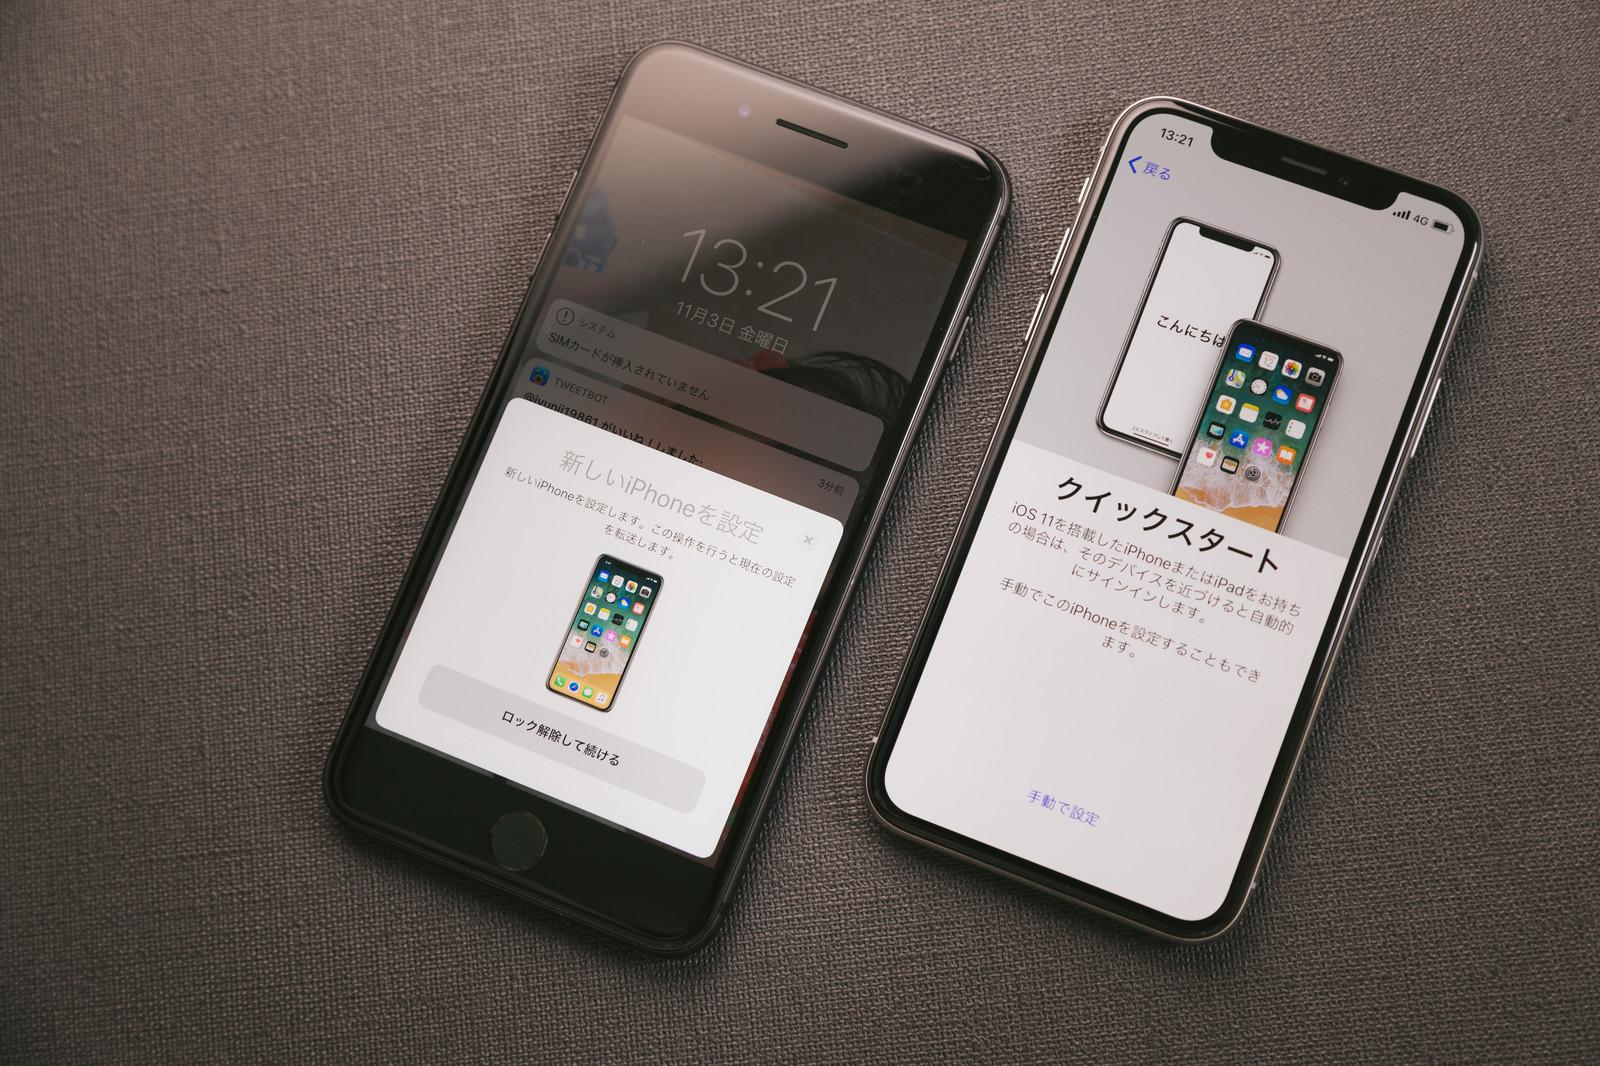 iPhone XSとiPhone Xの違いは?Androidともスペック比較してみた